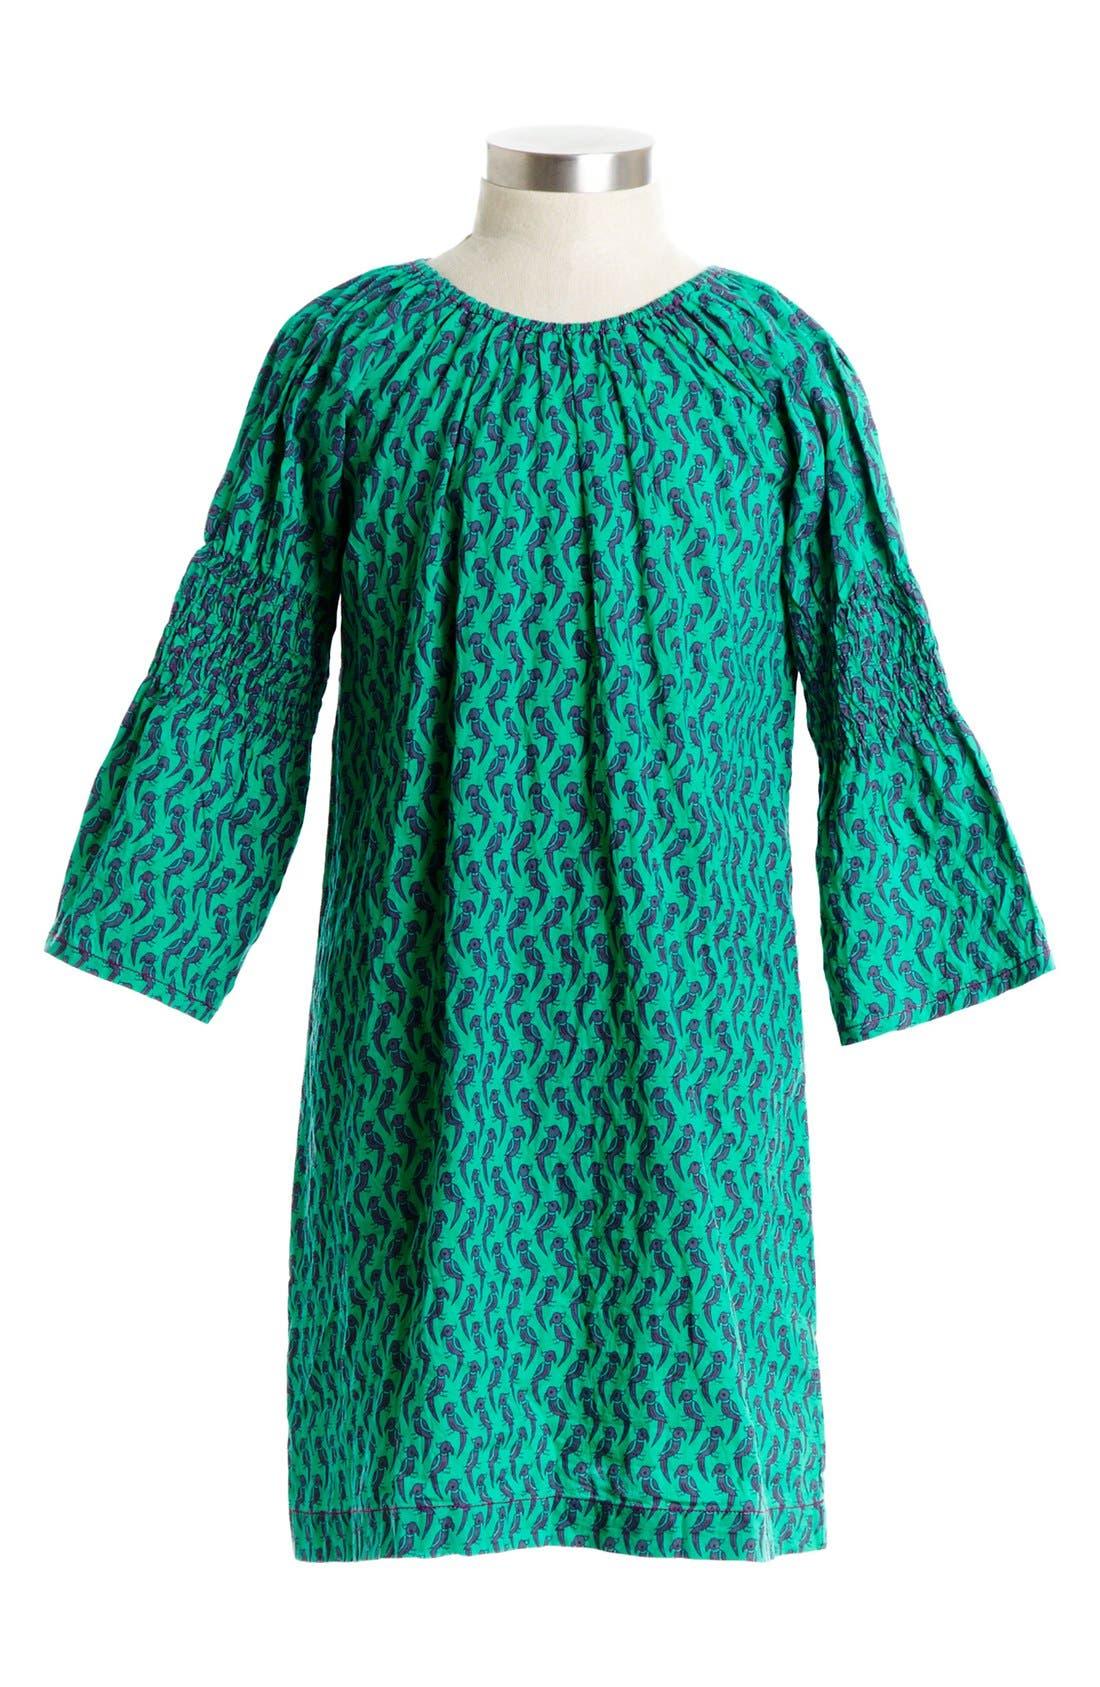 Main Image - Peek 'Simona' Smocked Sleeve Dress (Toddler Girls, Little Girls & Big Girls)